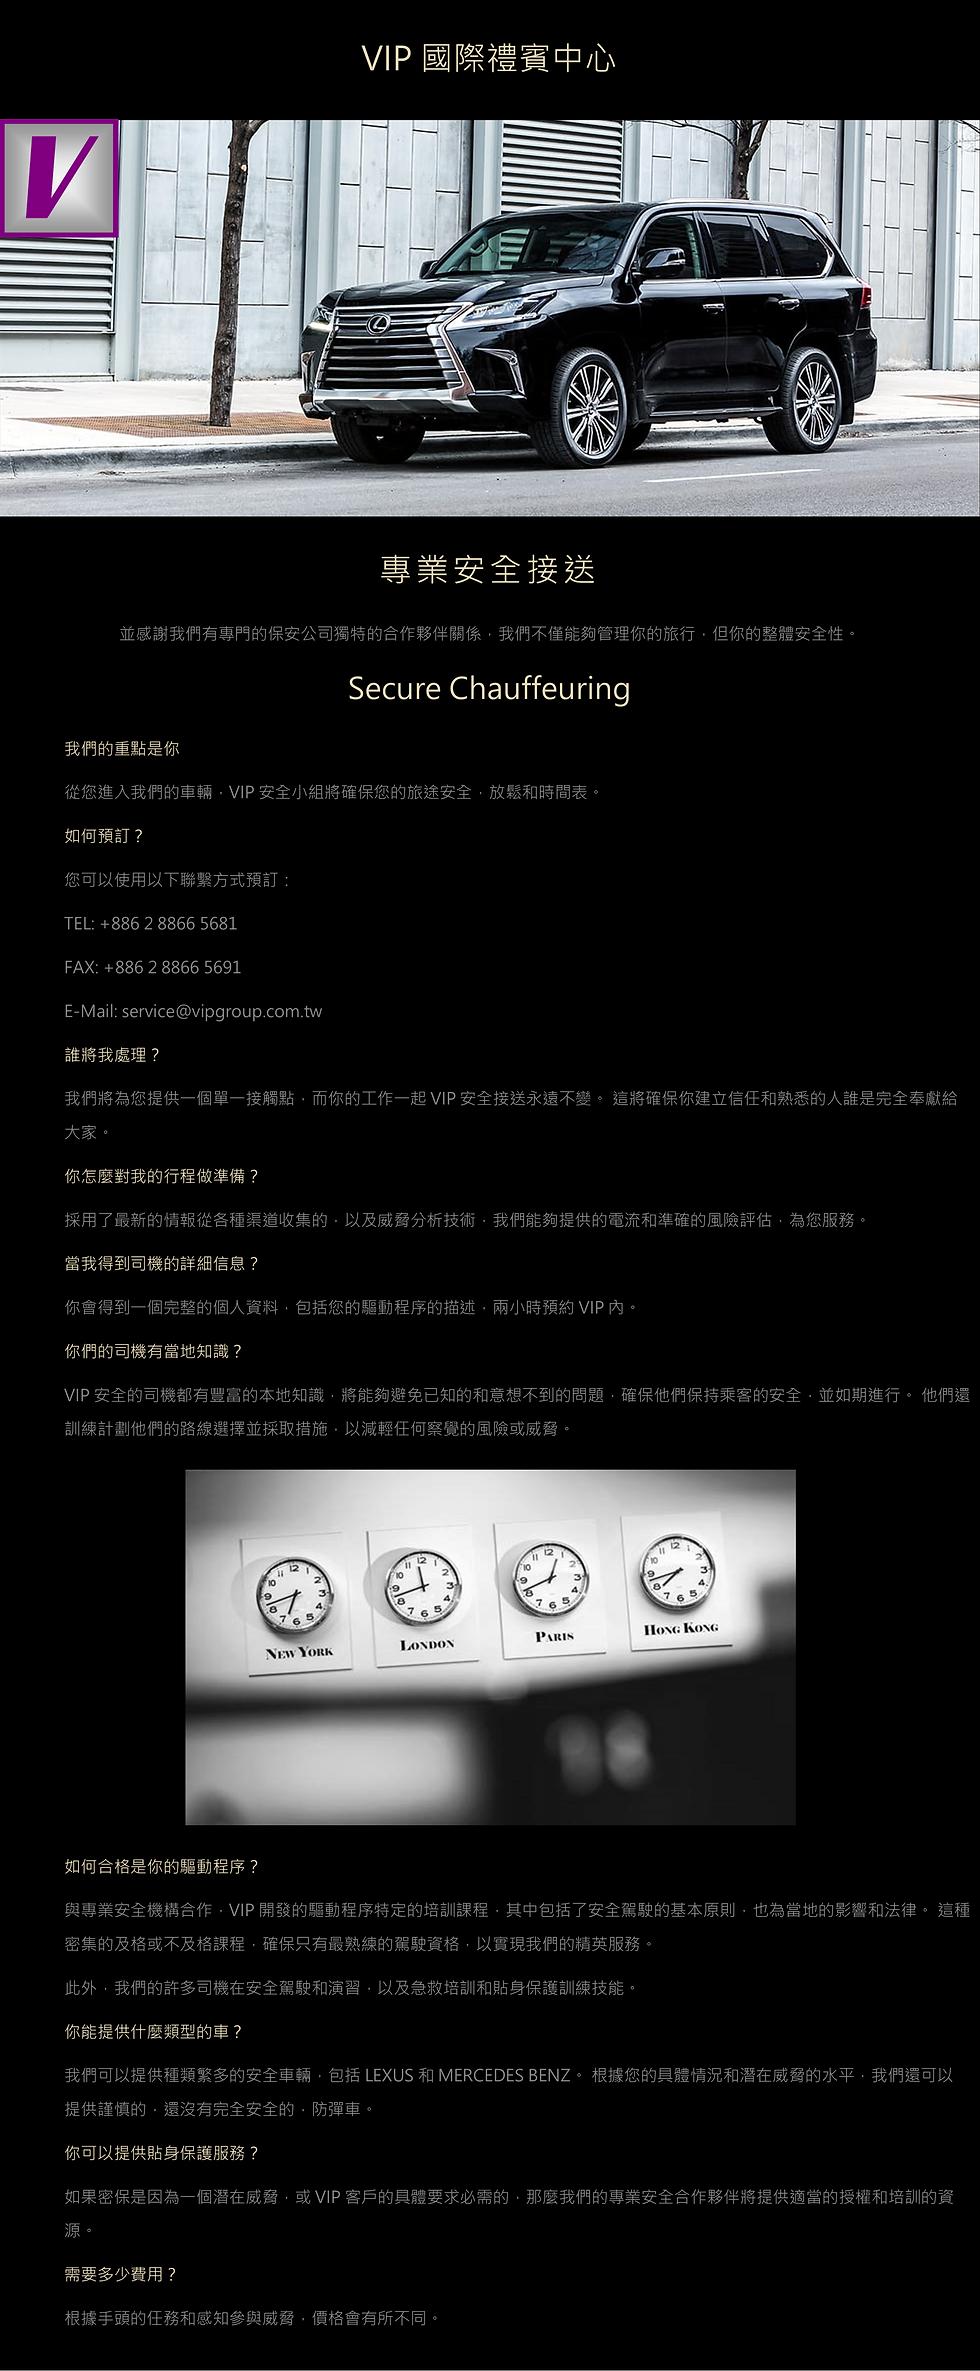 VIP國際禮賓中心 專業安全接送.png